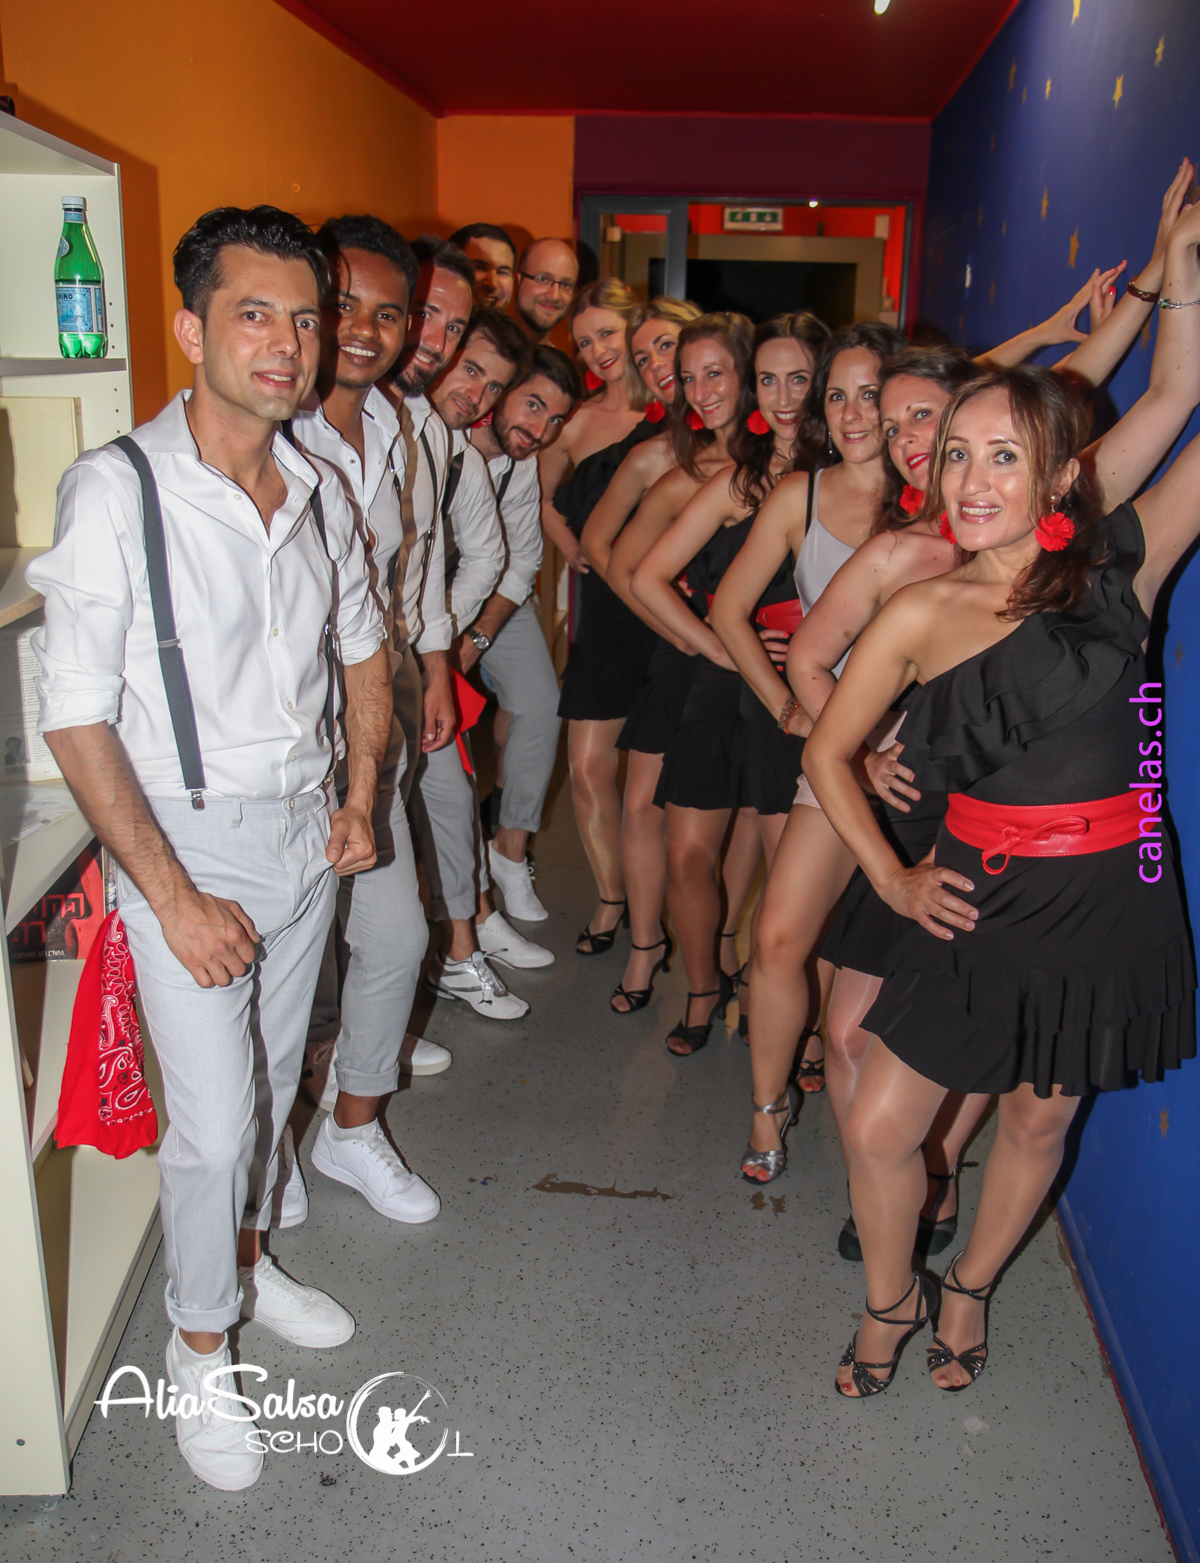 AliaSalsa ecole de danse lausanne soiree bachata salsa cubaineAlia Salsa Soireé Salsa - Bachata-13